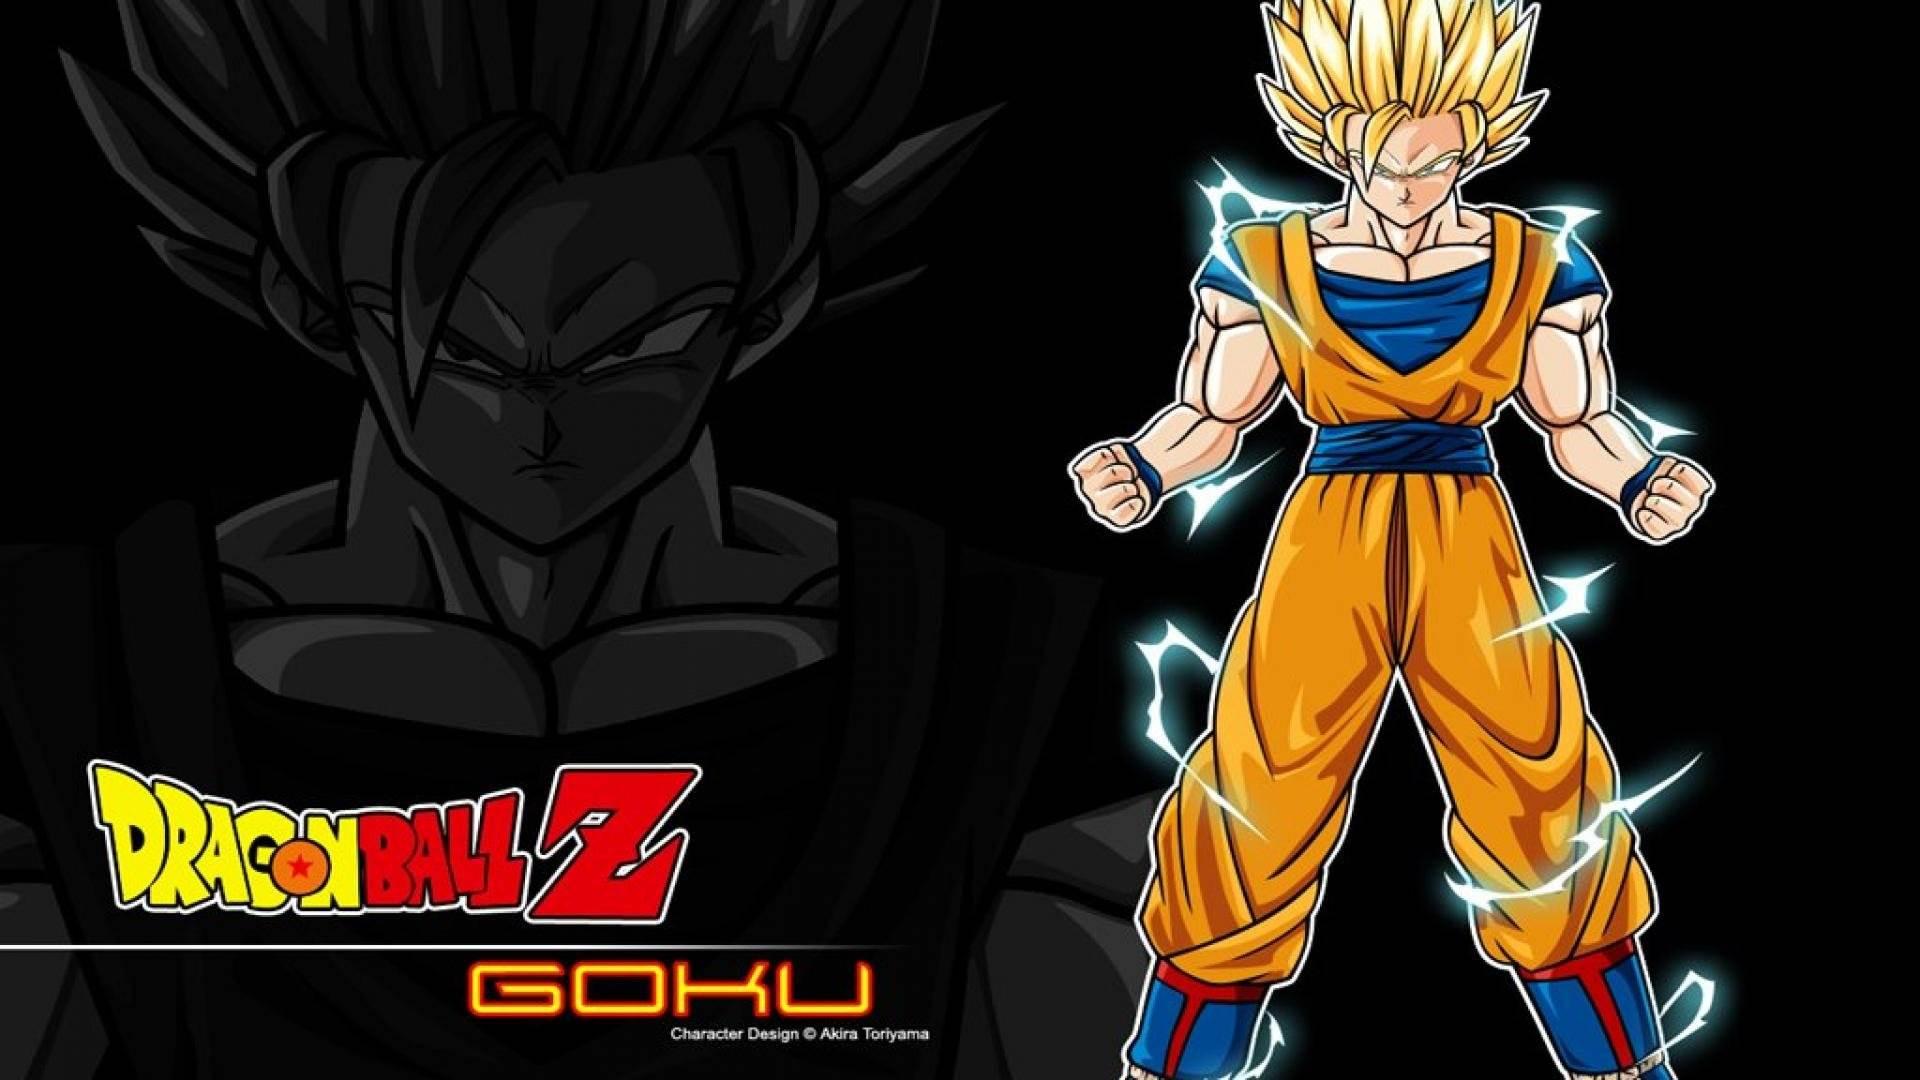 Goku Super Saiyan Wallpaper 1920x1080